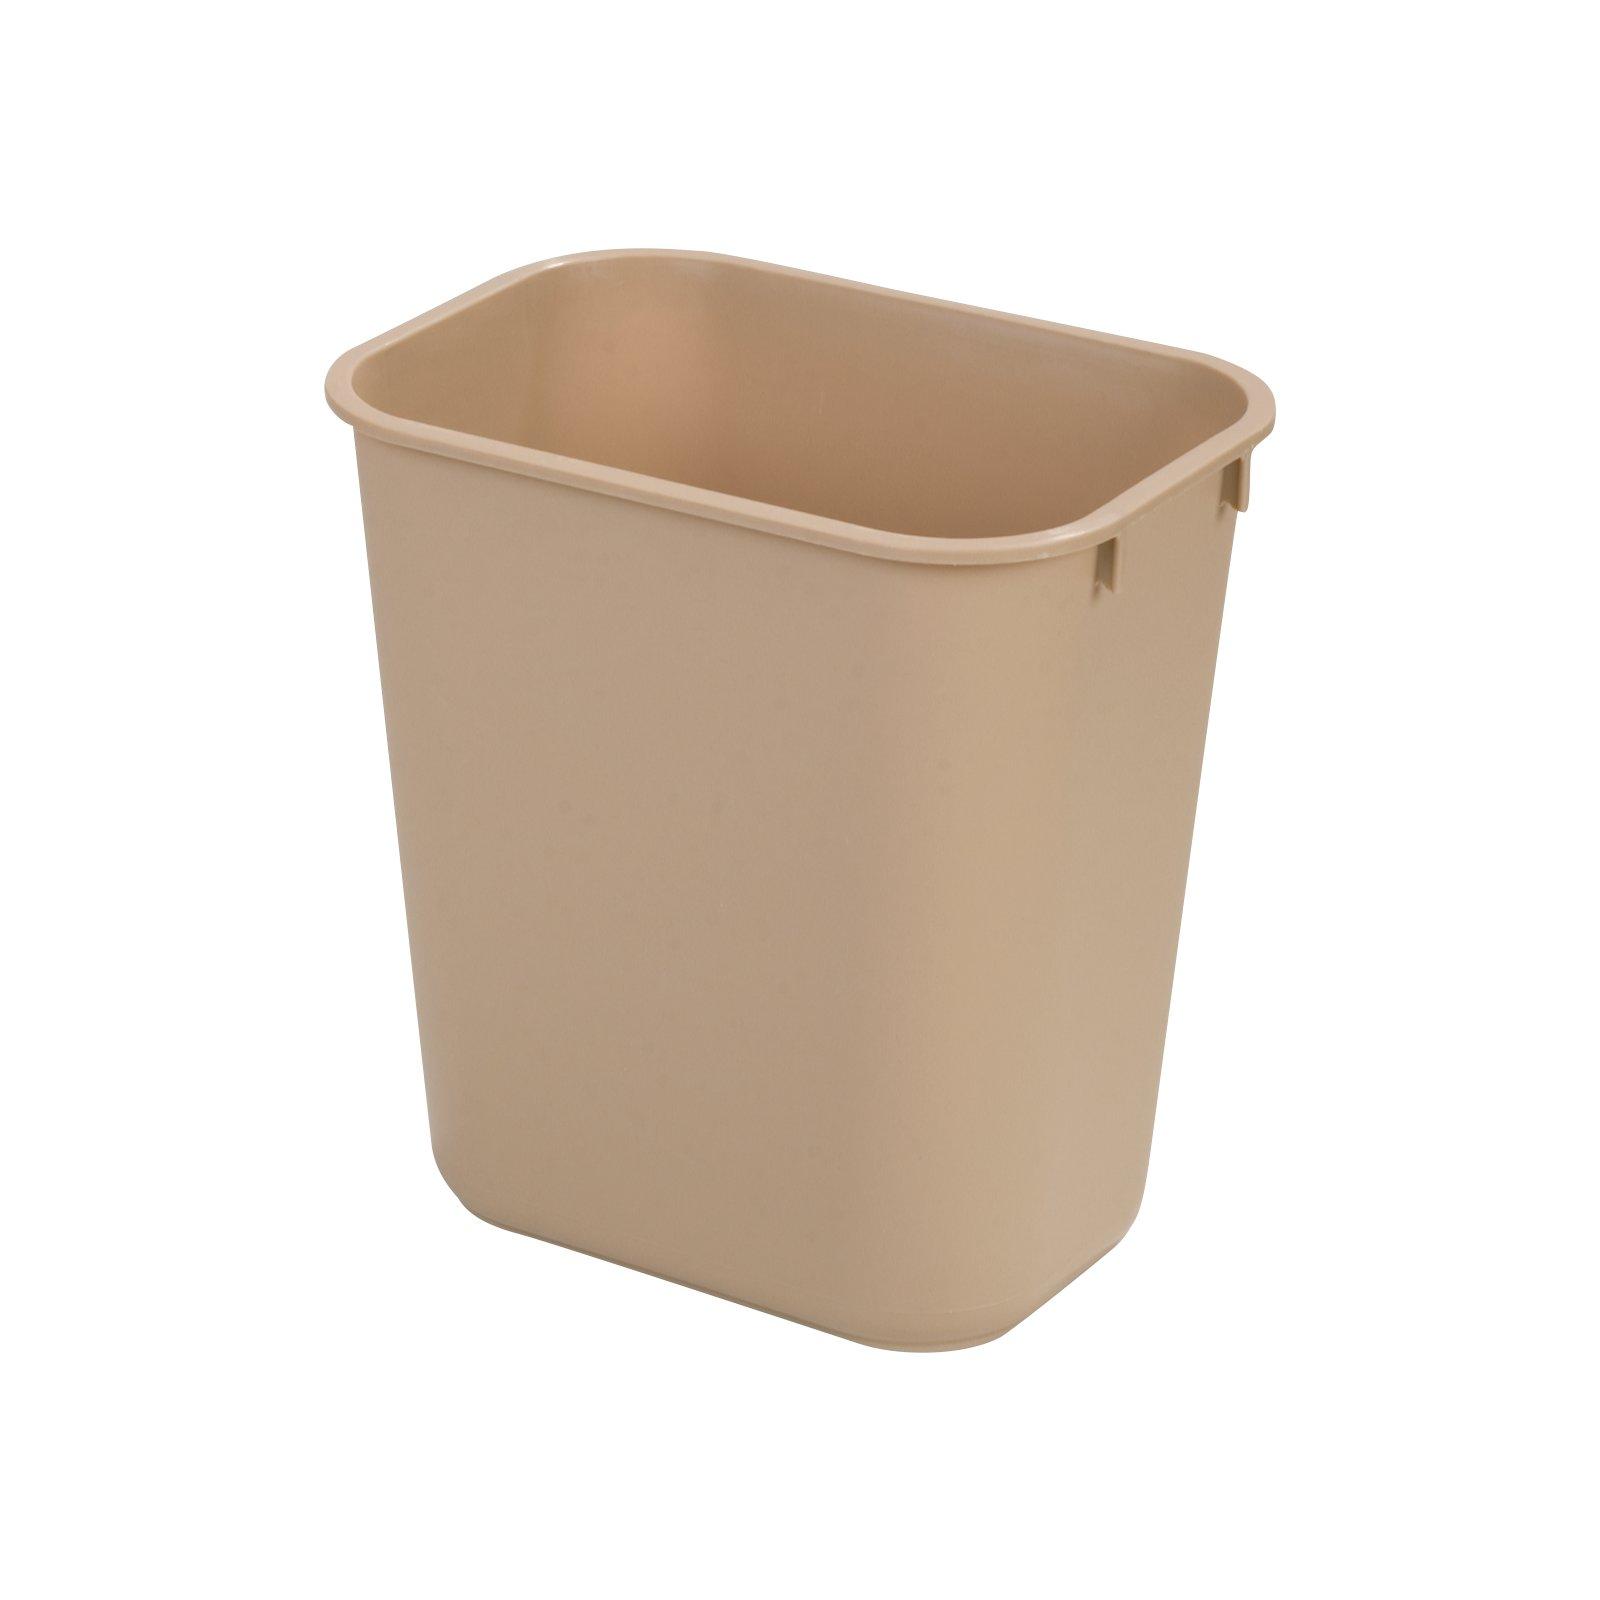 3700-50 Carlisle 28qt Beige Waste Basket, Plastic